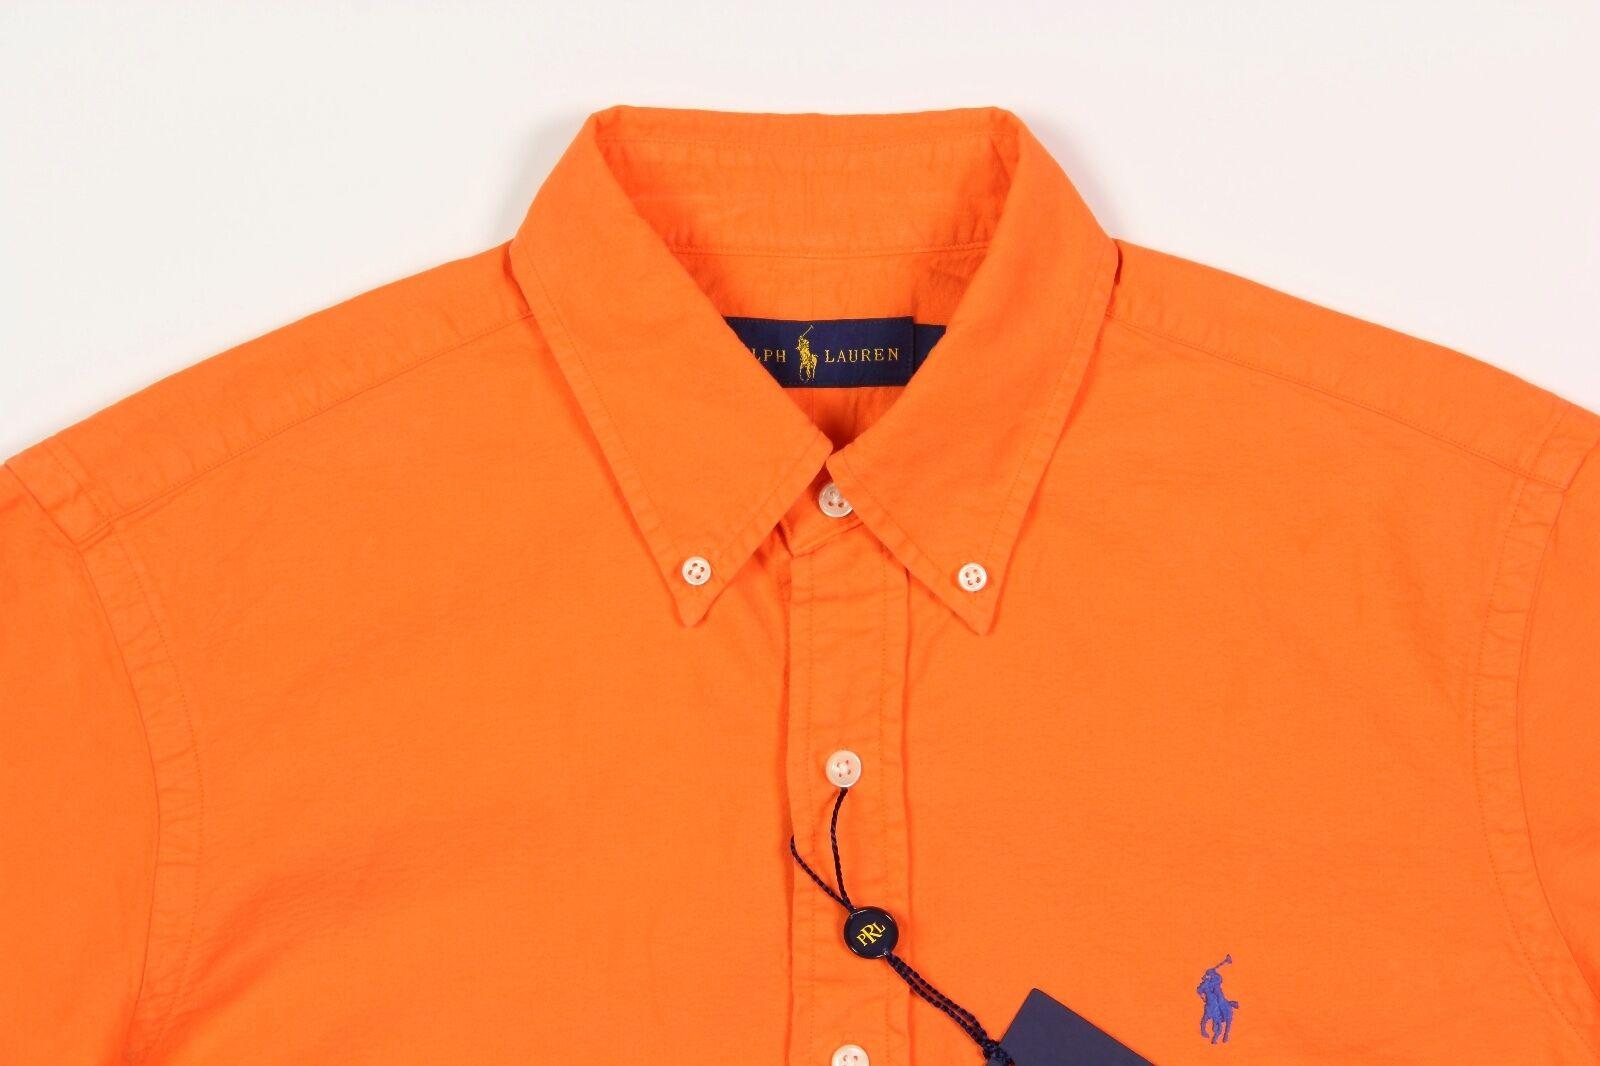 269b2c9b0 Men's RALPH LAUREN Resort orange Short Sleeve S S Cotton Shirt XL XLarge  NWT NEW